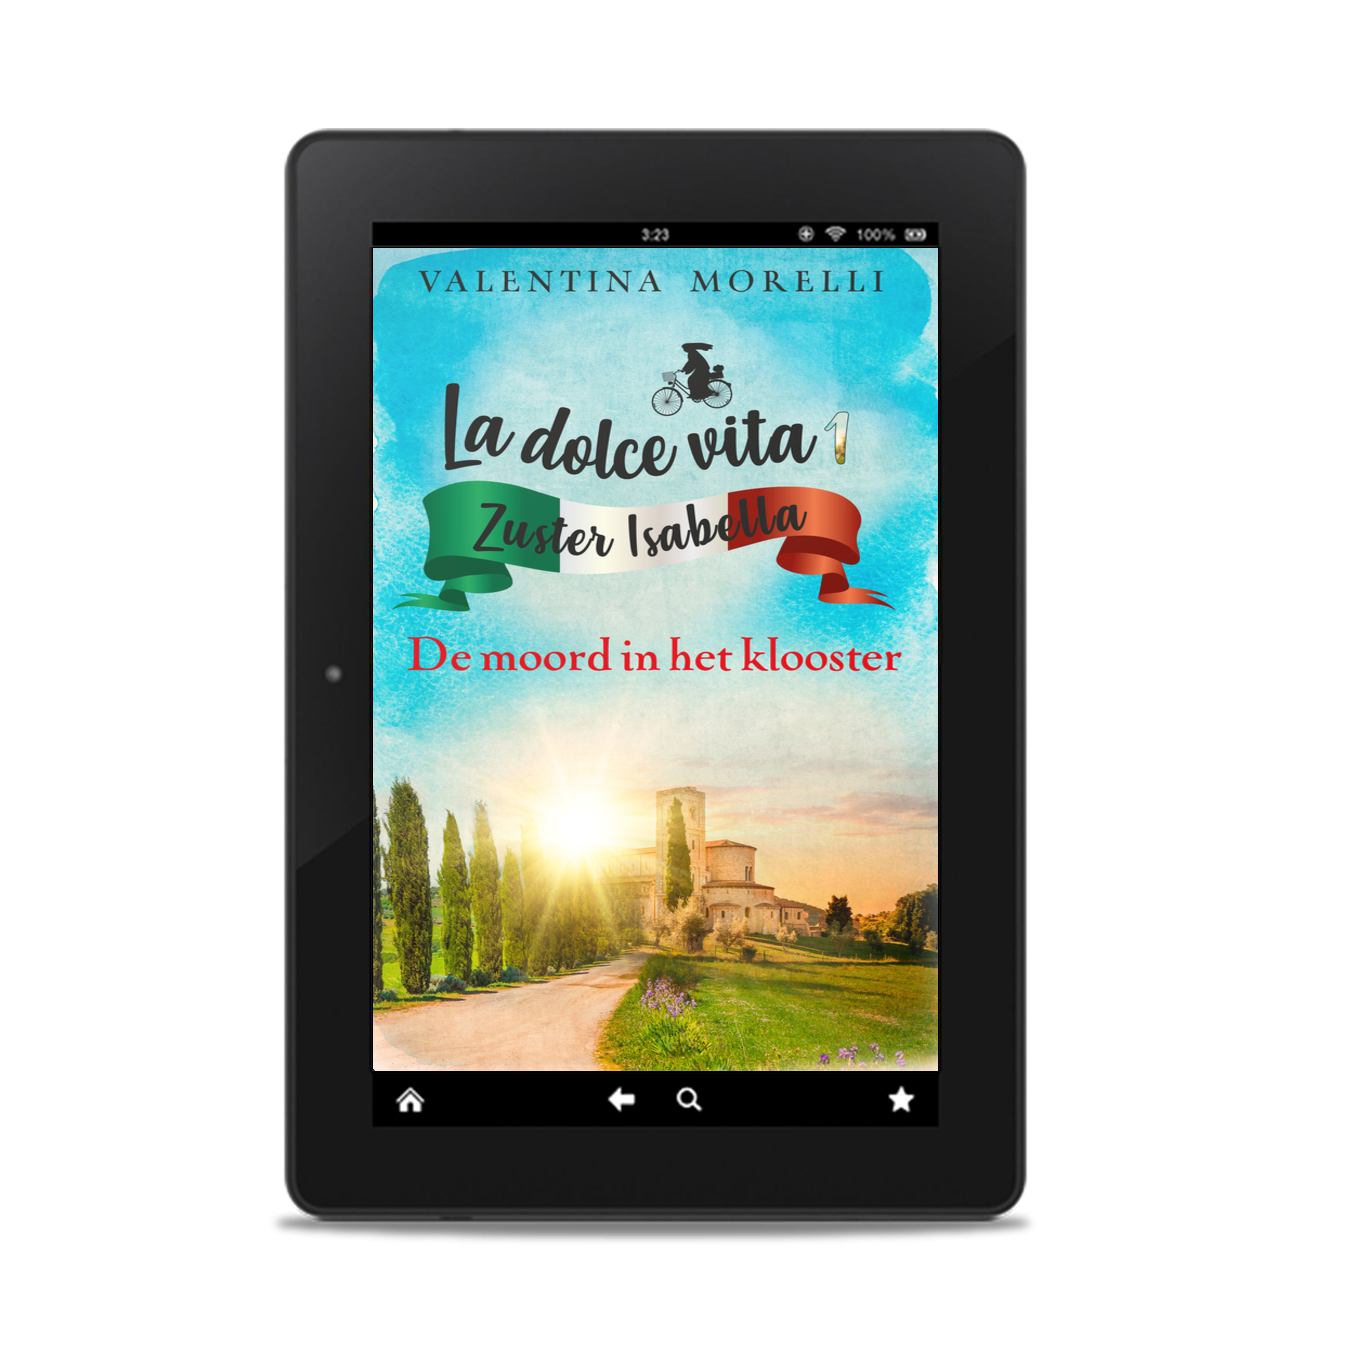 La dolce vita - De moord in het klooster